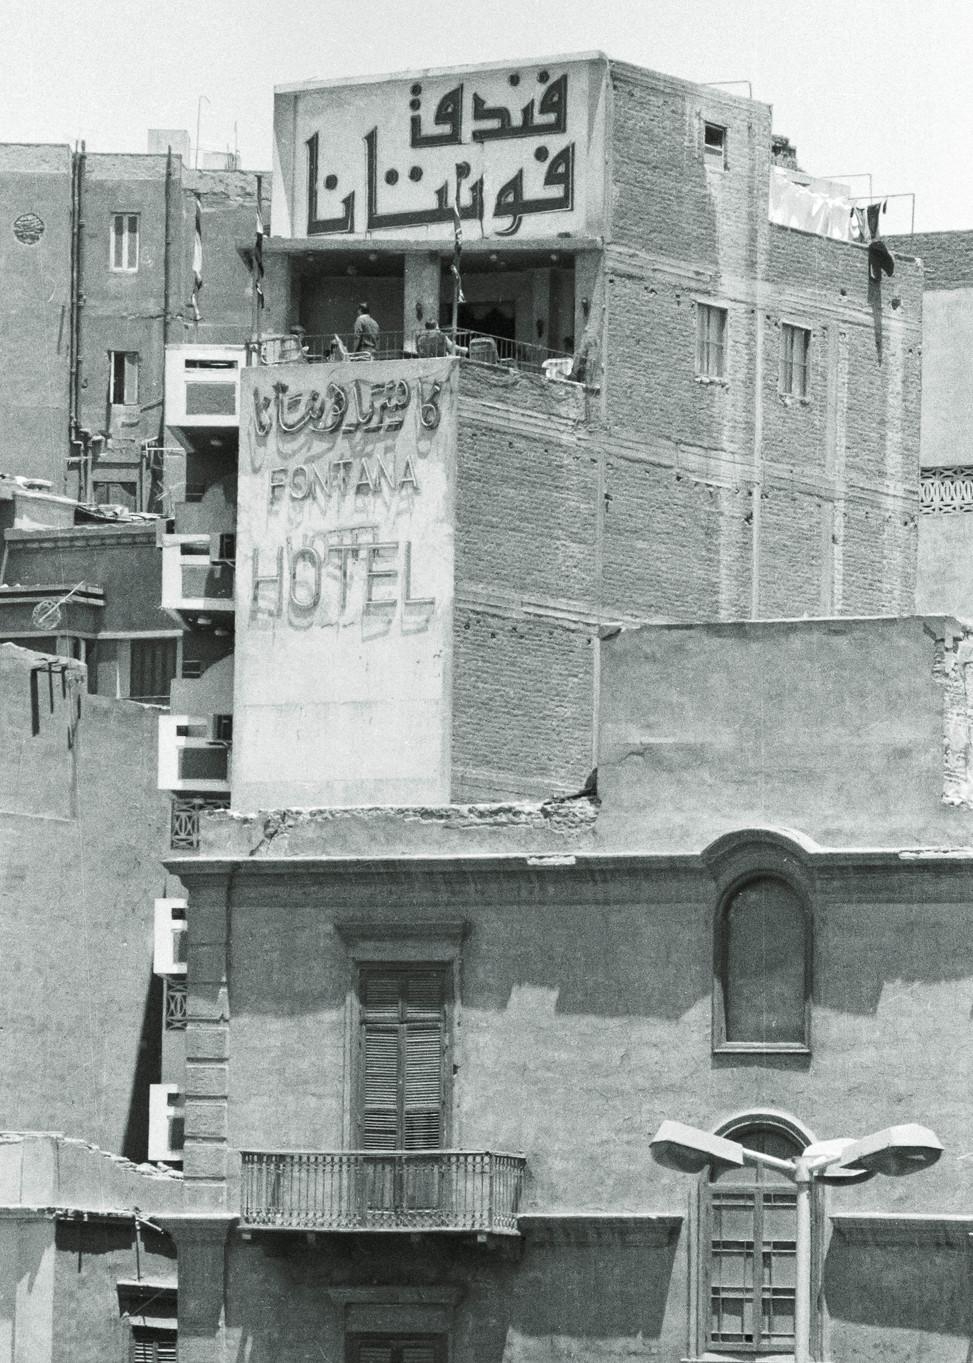 Hotel Fontana, Cairo